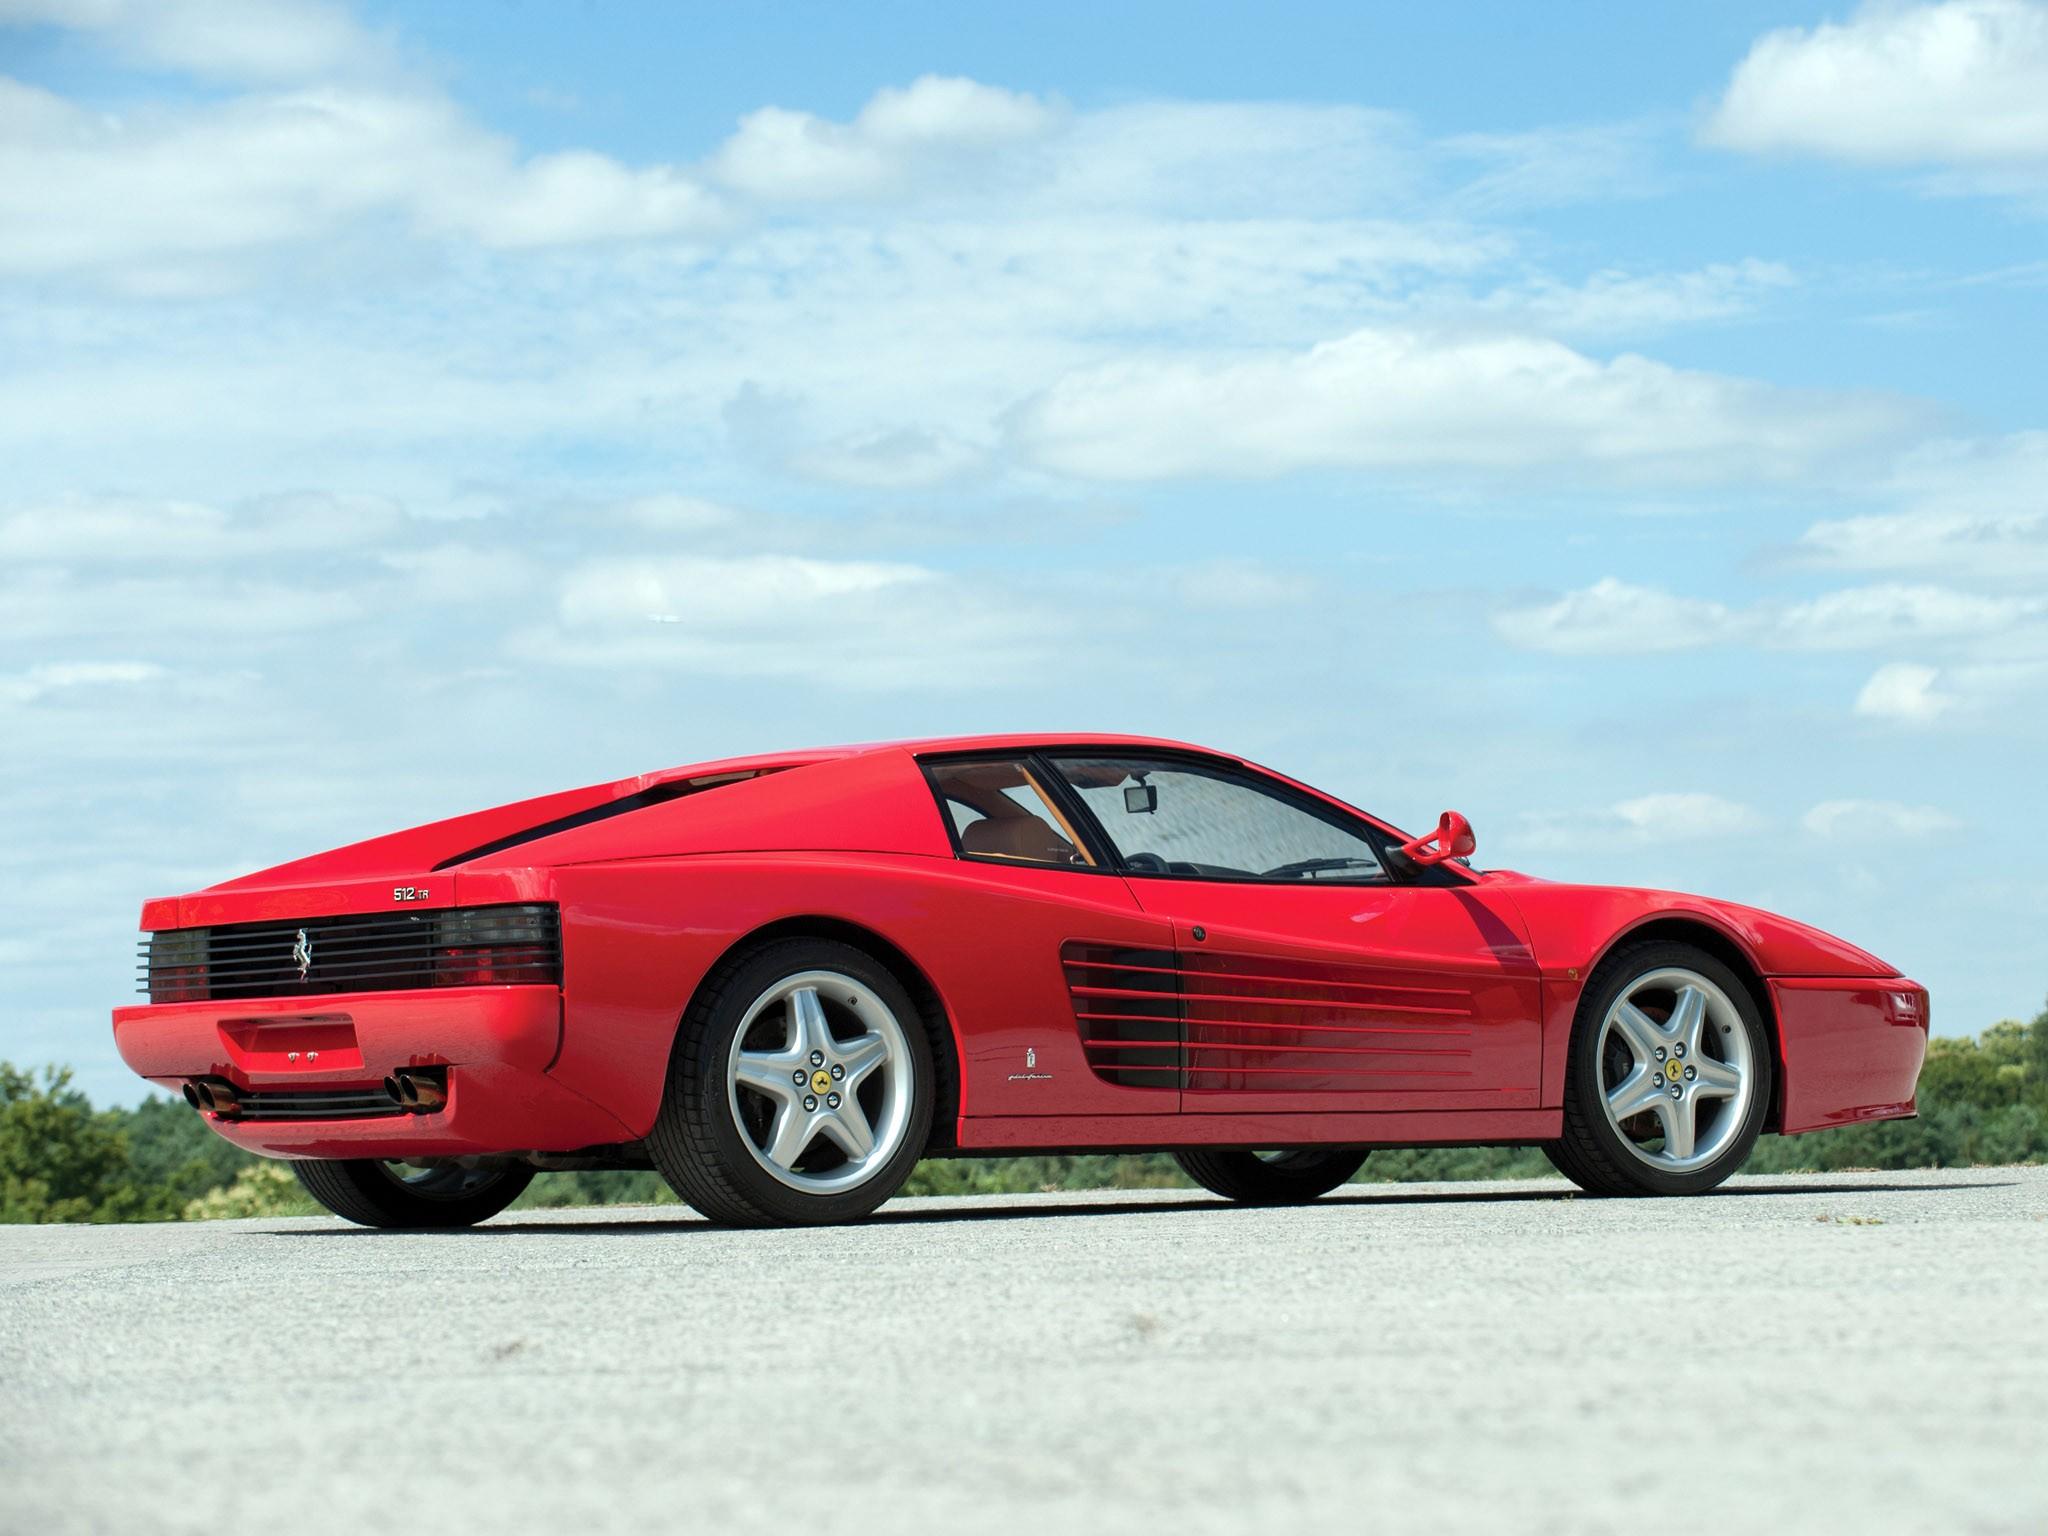 Ferrari 512 TR Testarossa 1992